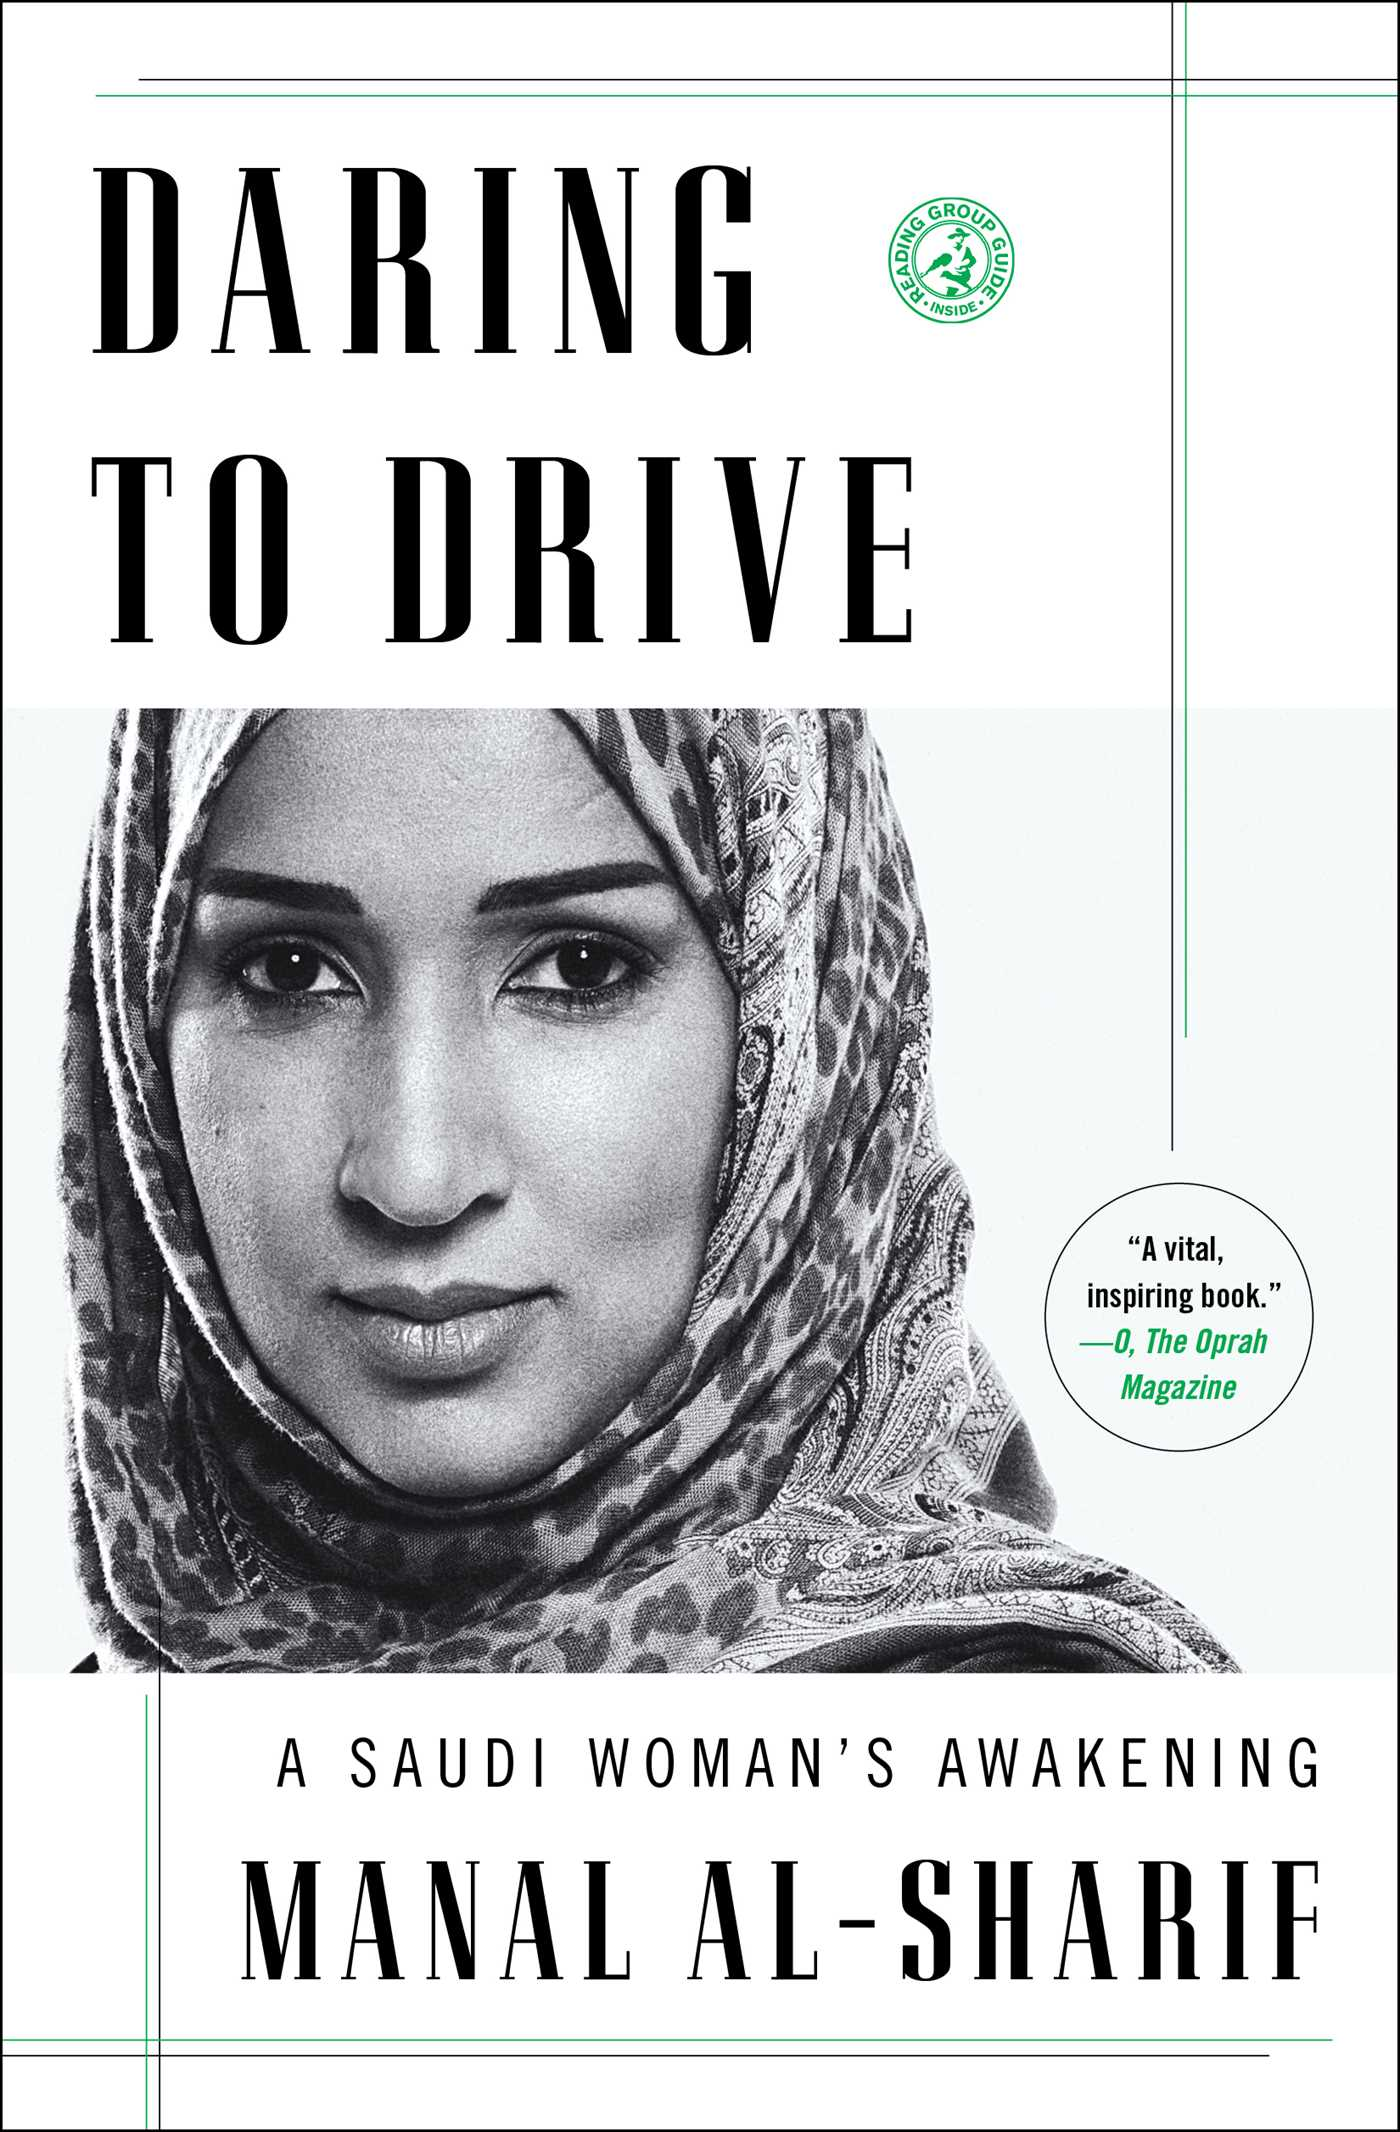 Daring to Drive A Saudi Woman's Awakening